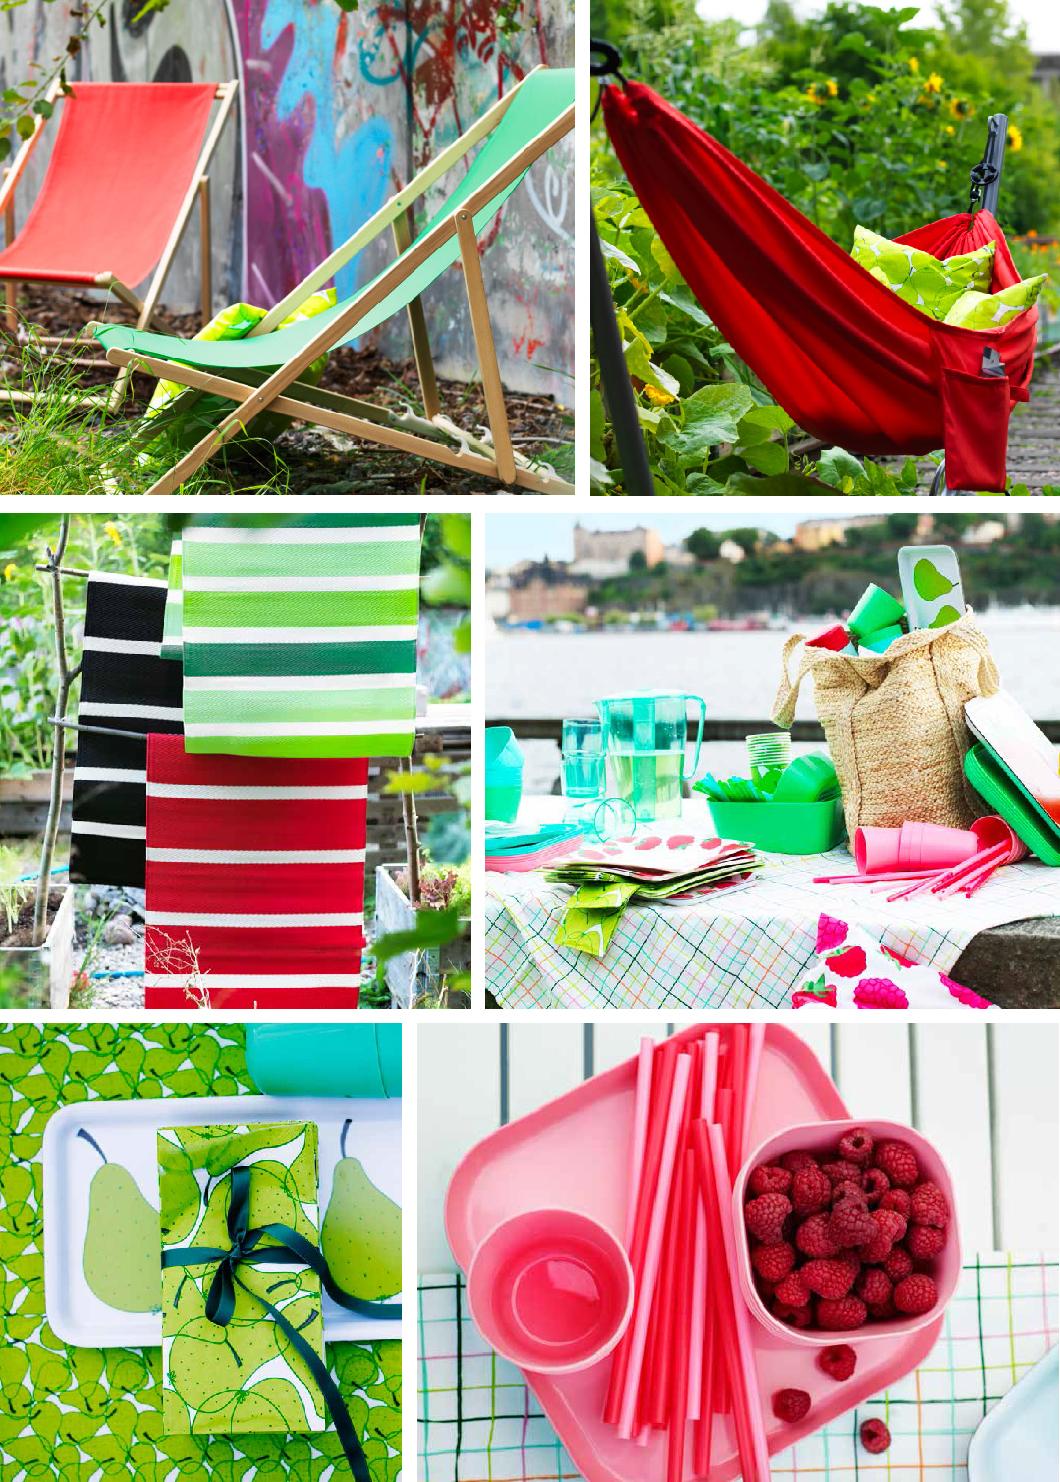 Ikea estate 2015 catalogo esterni mobili da giardino for Ikea catalogo tende